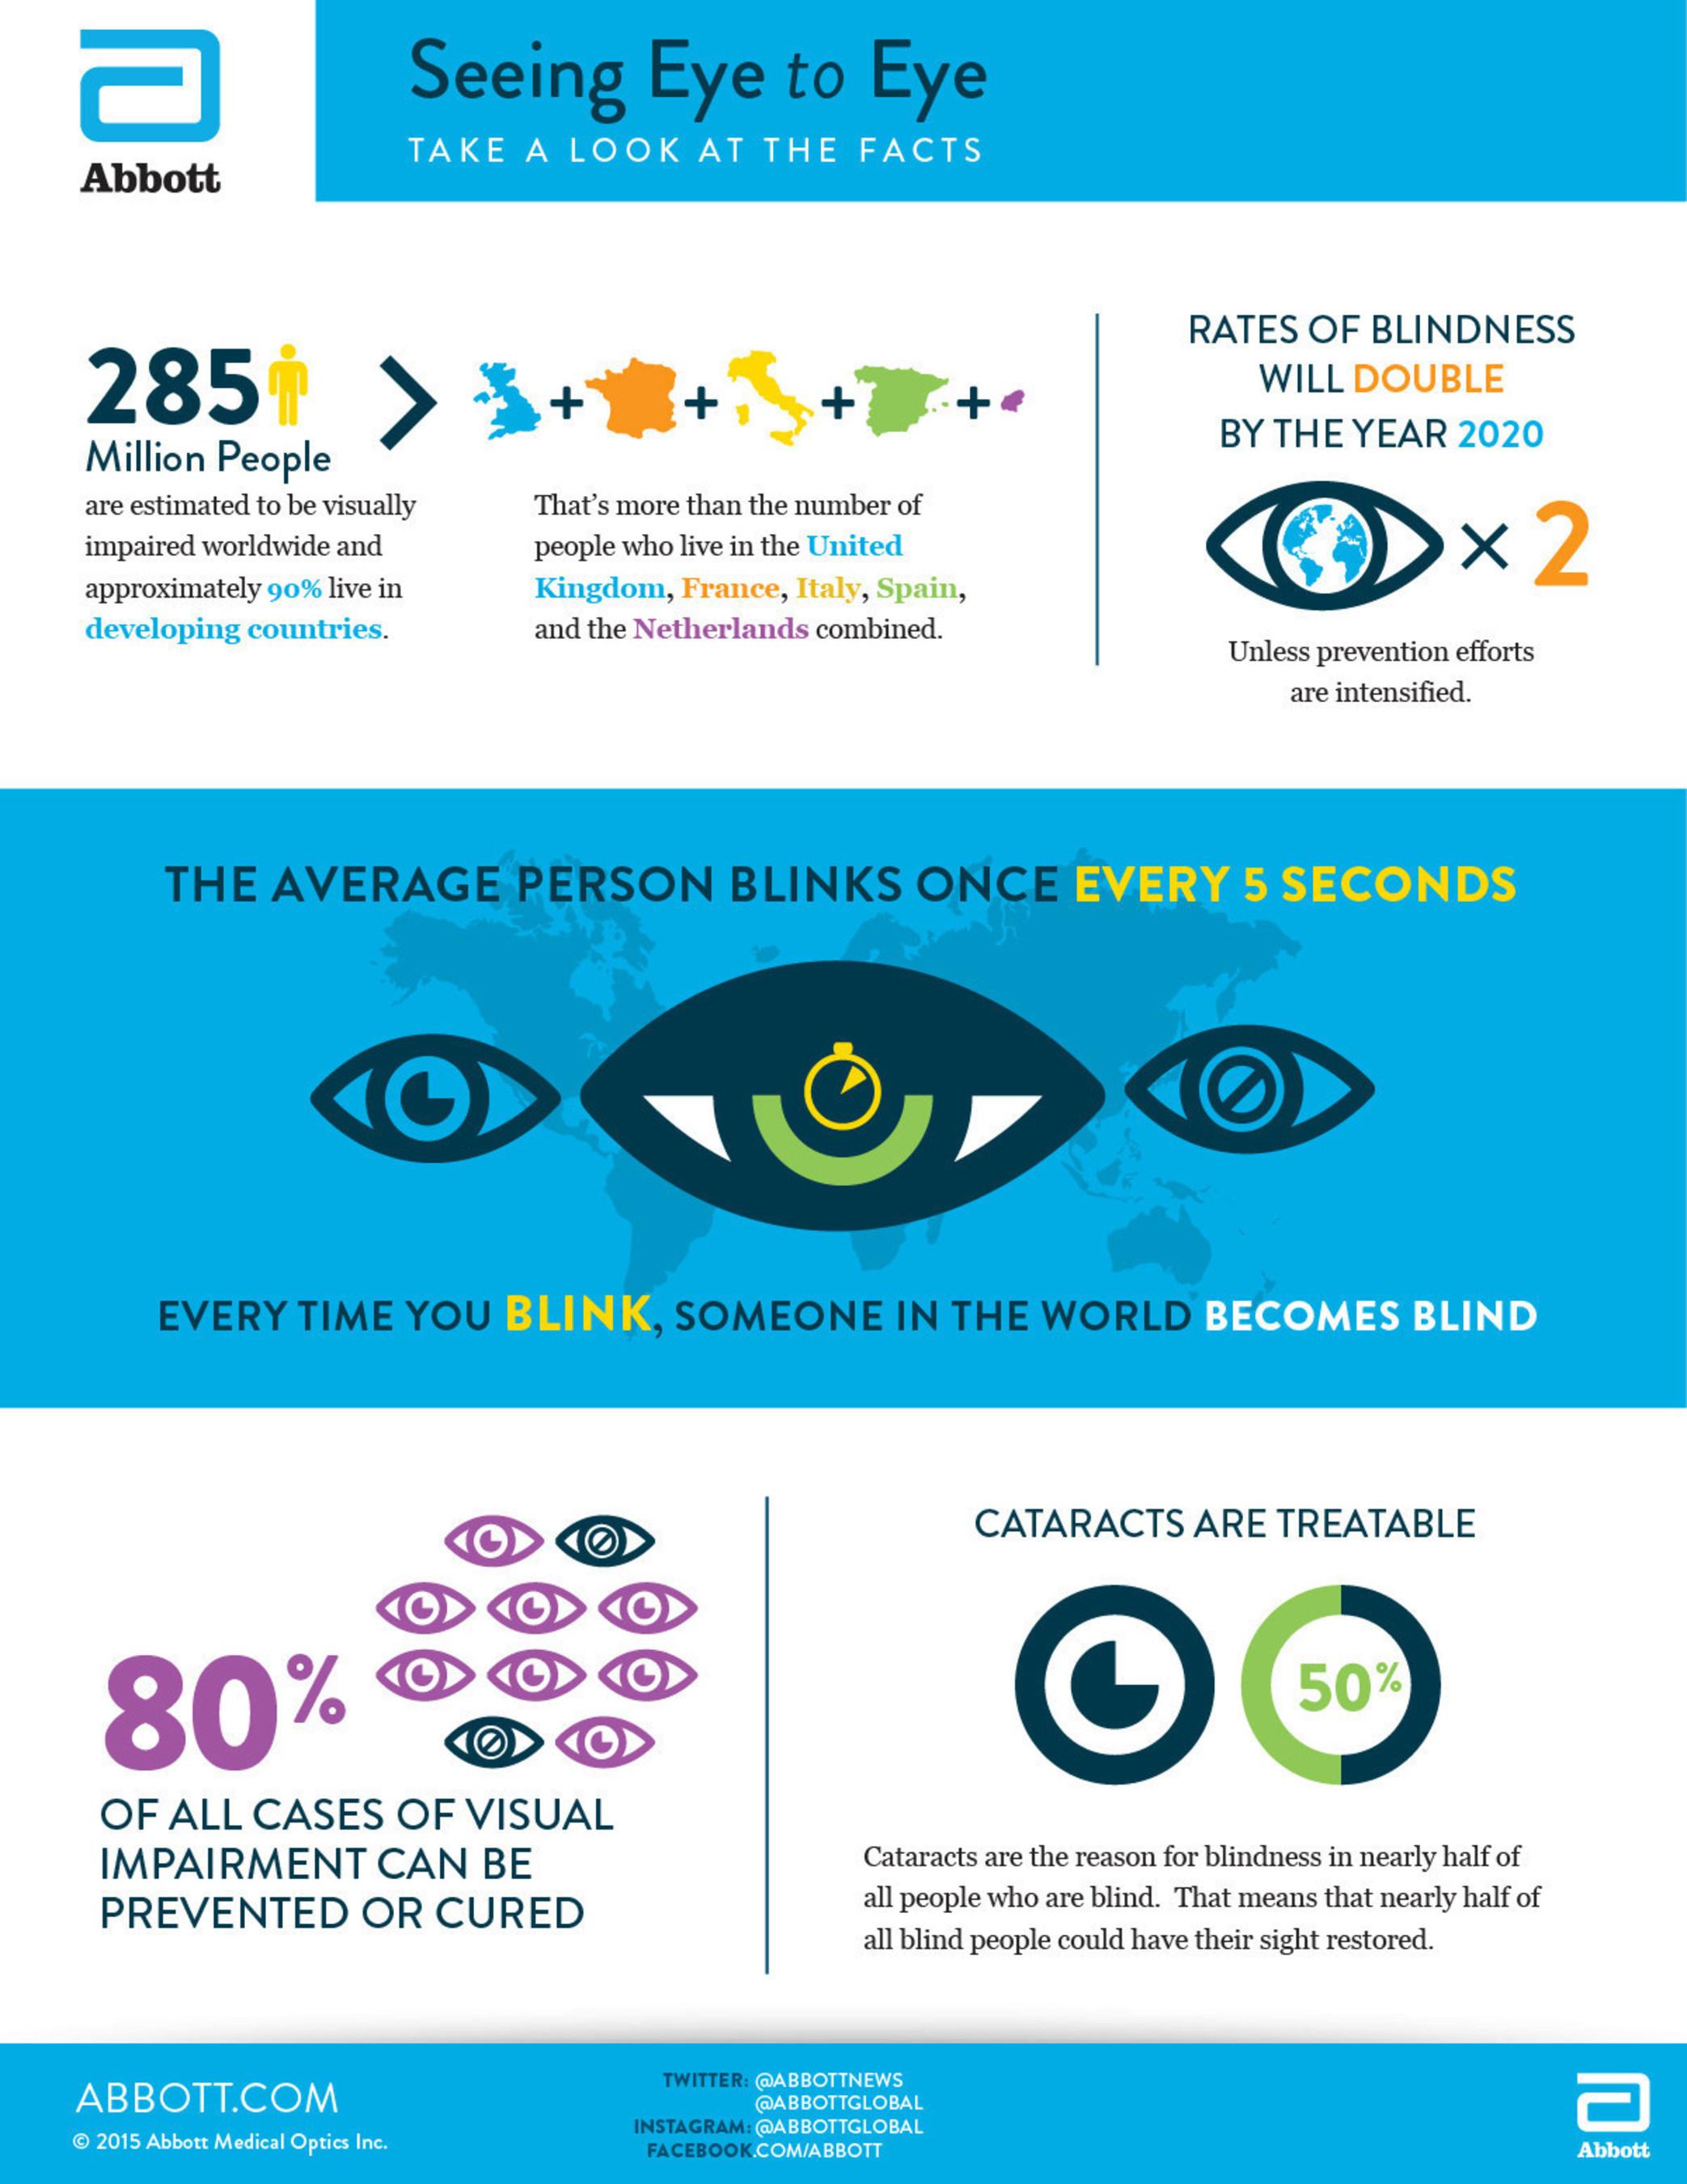 Abbott seeing eye to eye infographic